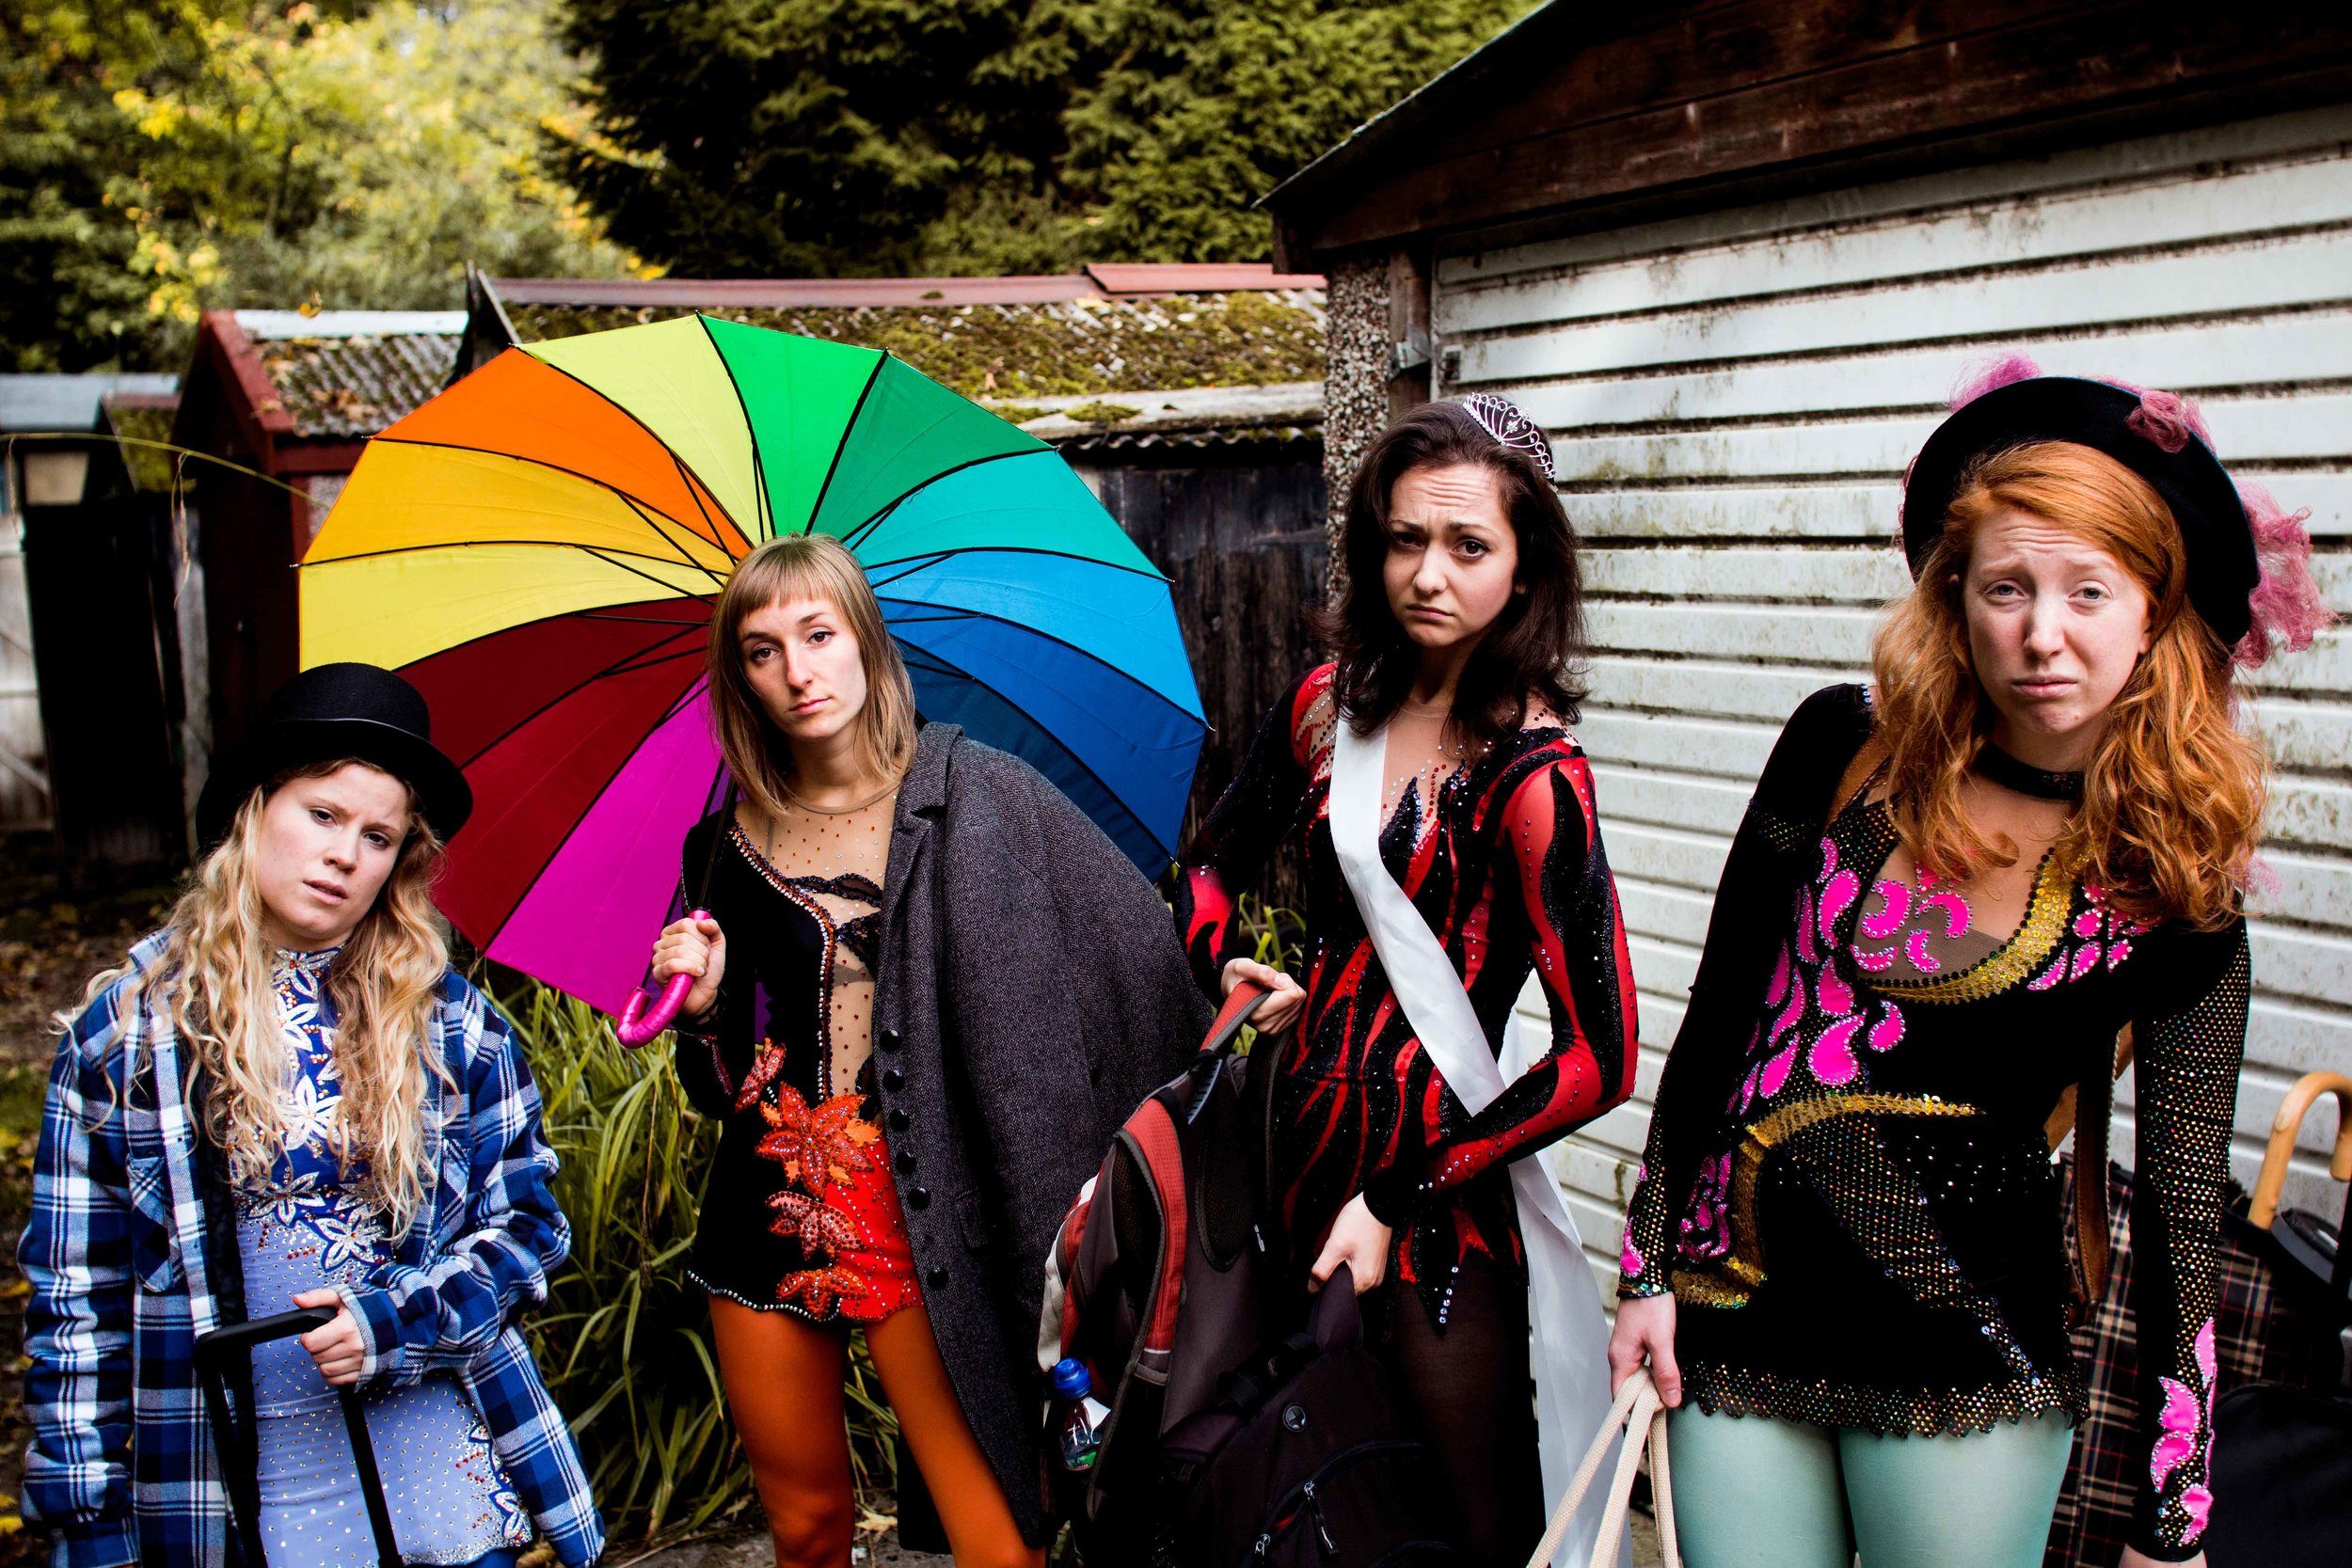 Gracefool Collective - nothing like Ultima Vez...